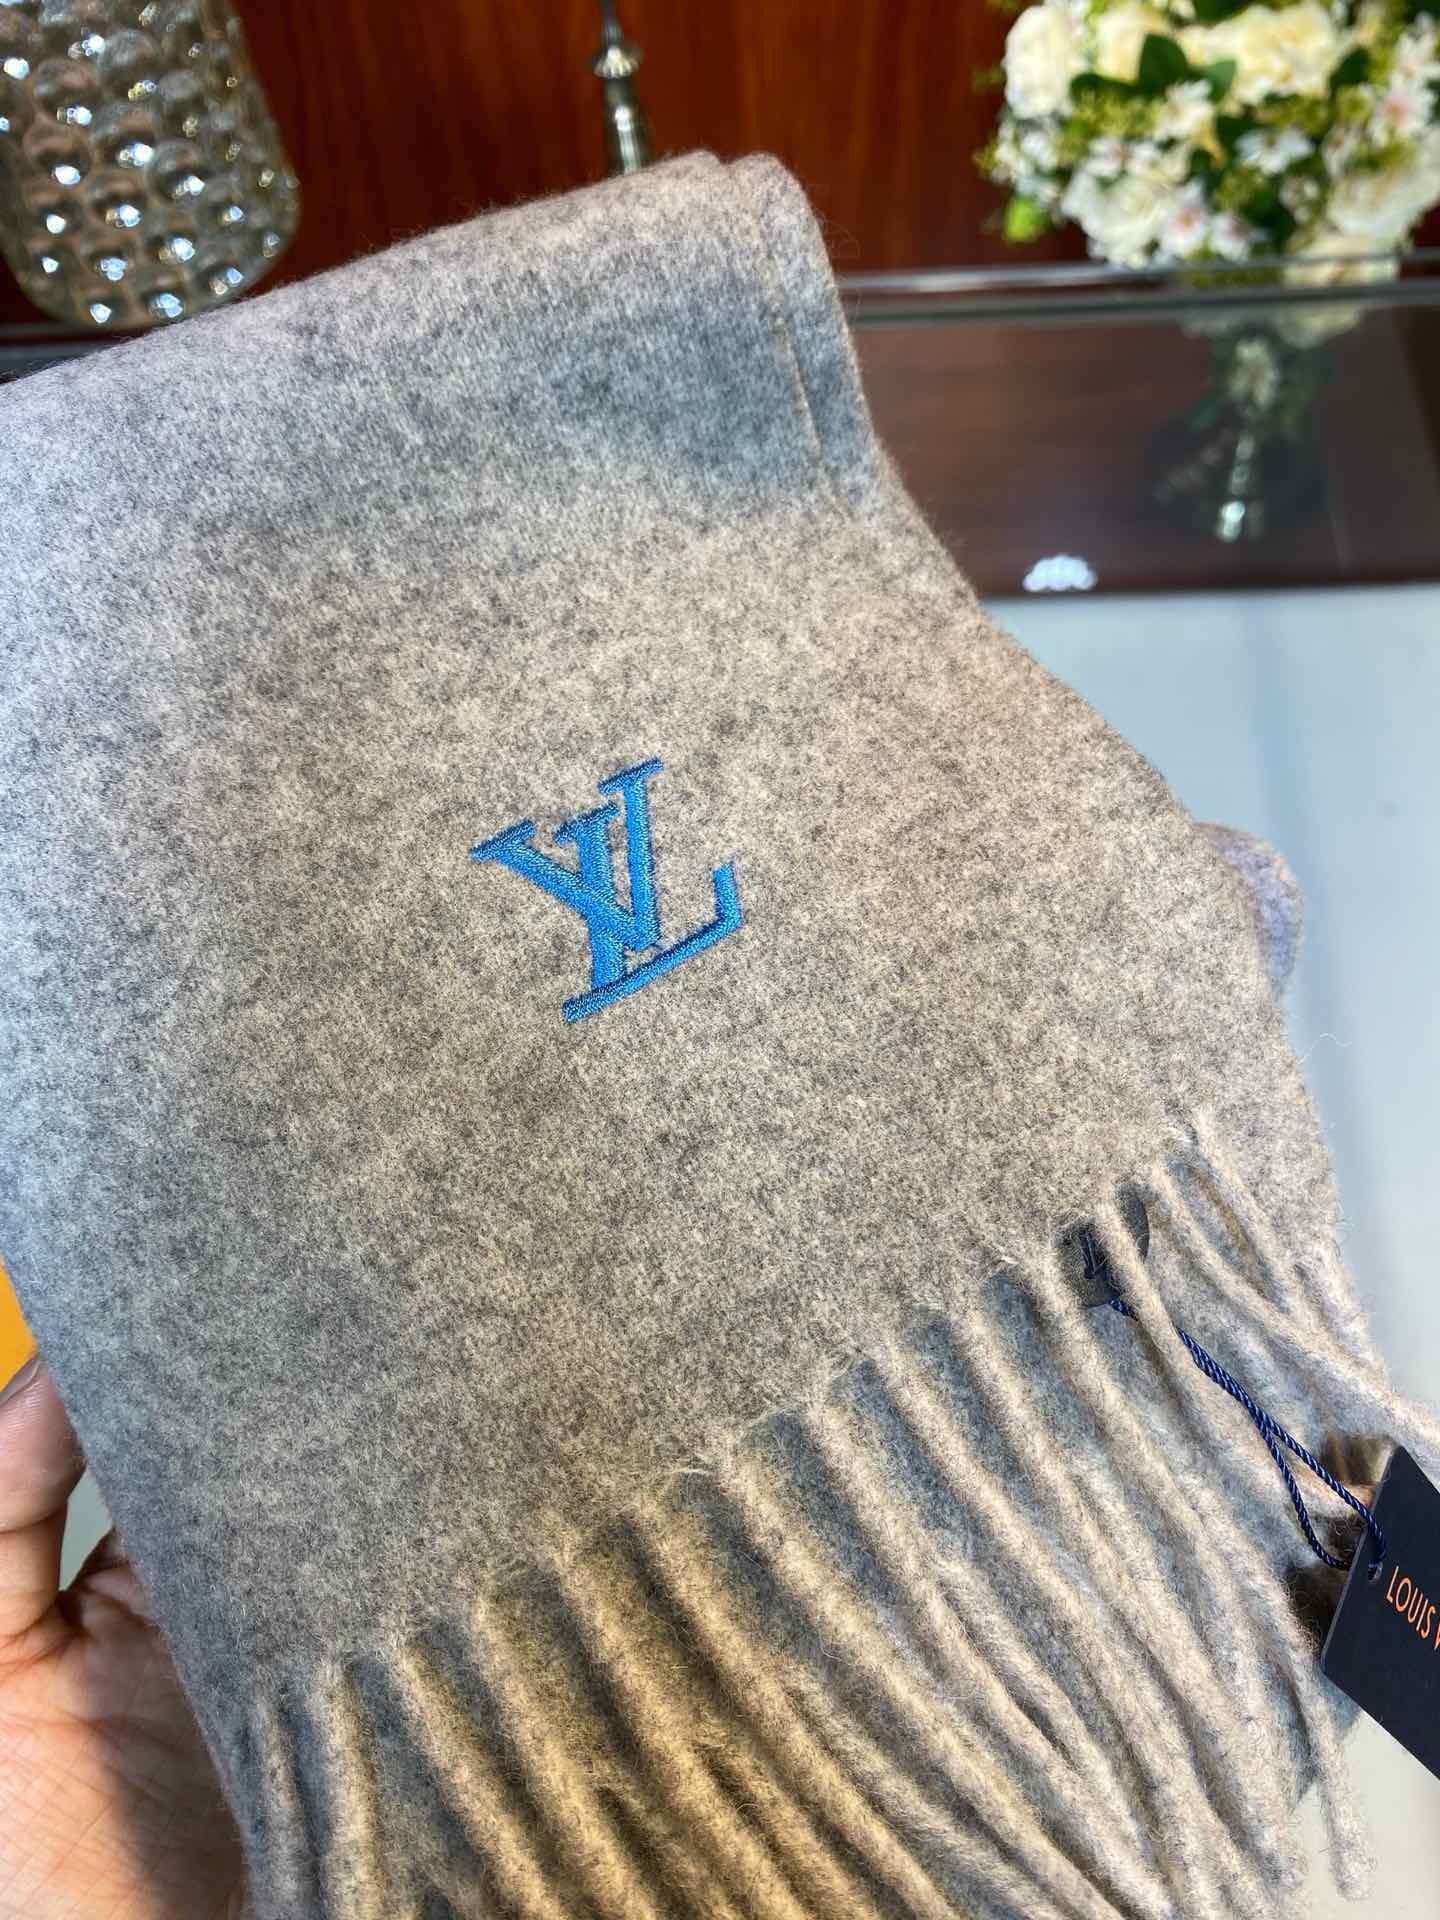 LV非常正的男士围巾面料大爱非常柔软